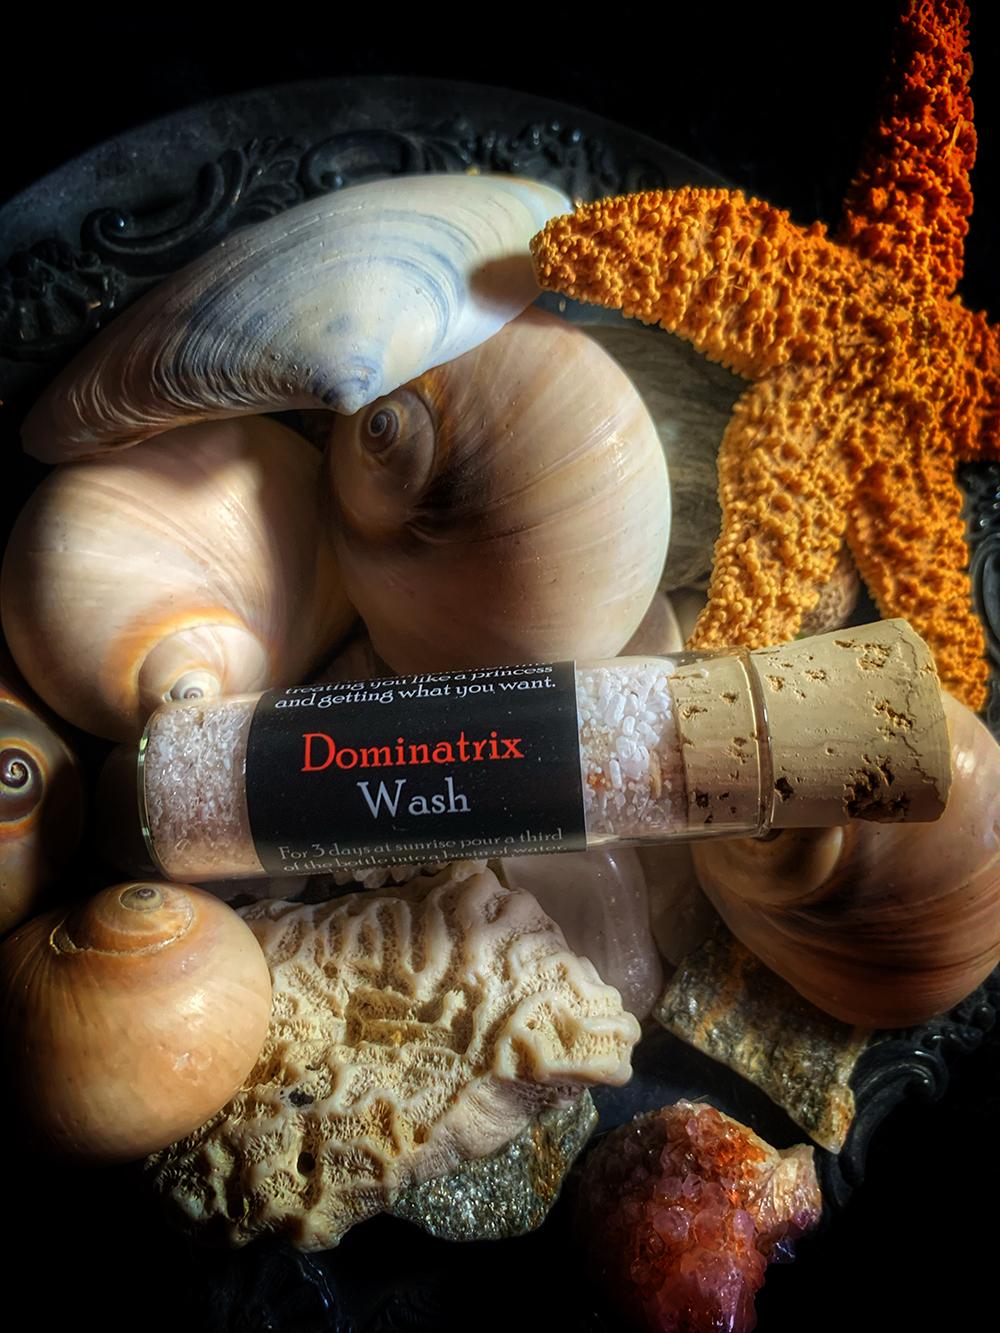 Dominatrix Ritual Wash